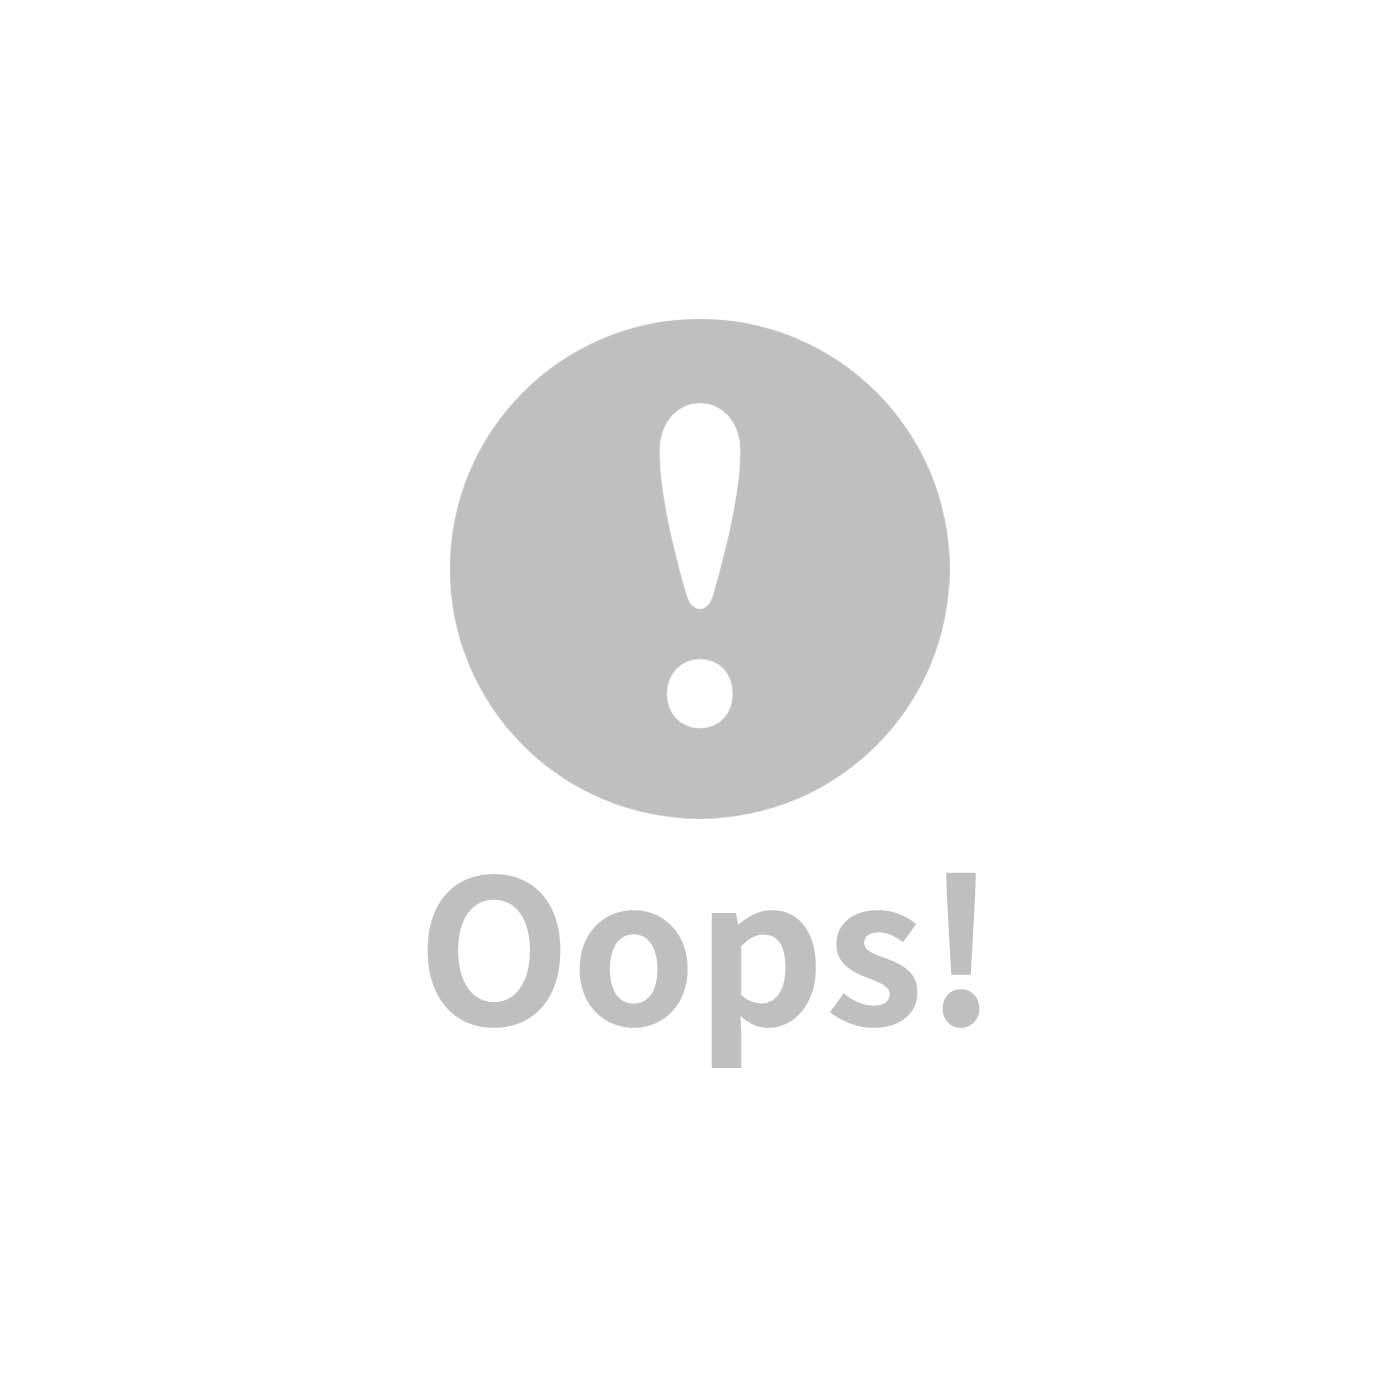 global affairs 童話手工編織安撫搖鈴_動物派對(長頸鹿)